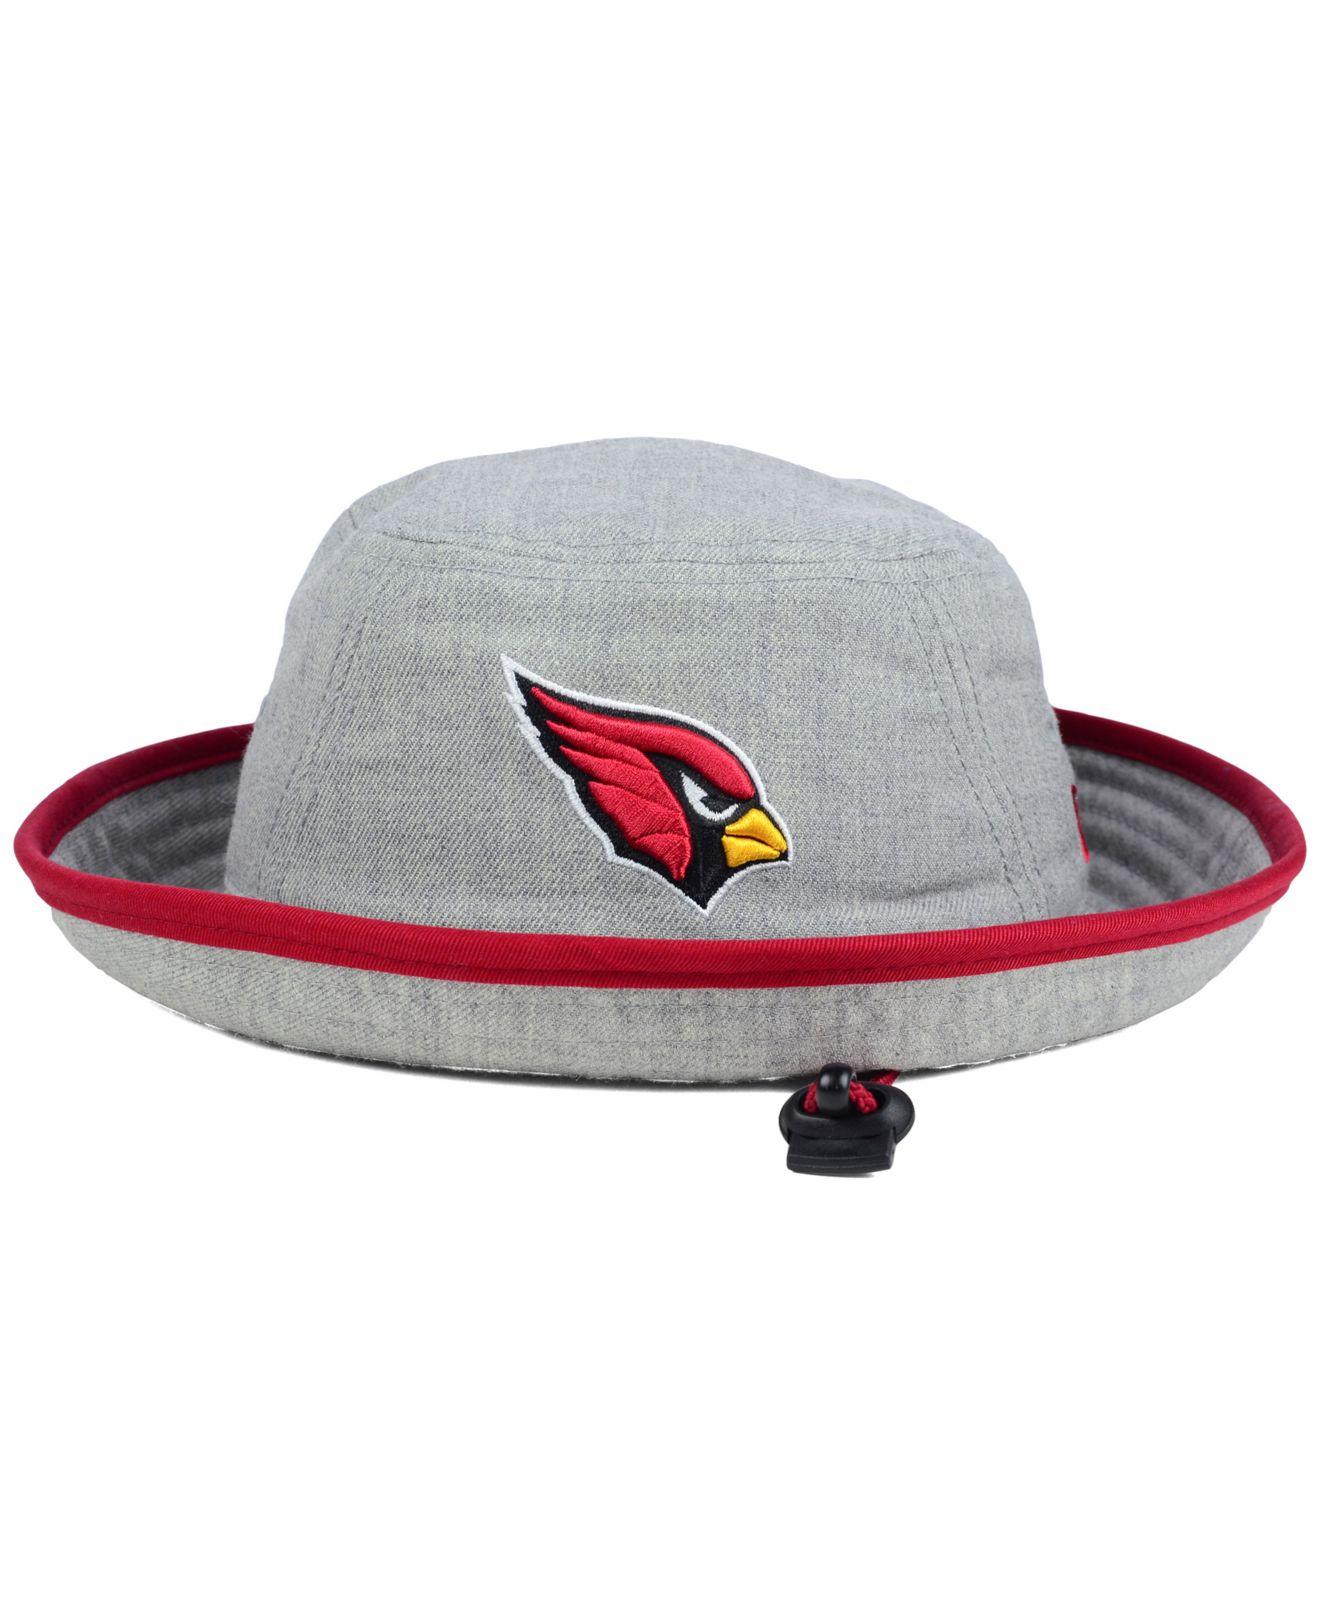 e02a7a94 KTZ Arizona Cardinals Nfl Heather Gray Bucket Hat for men